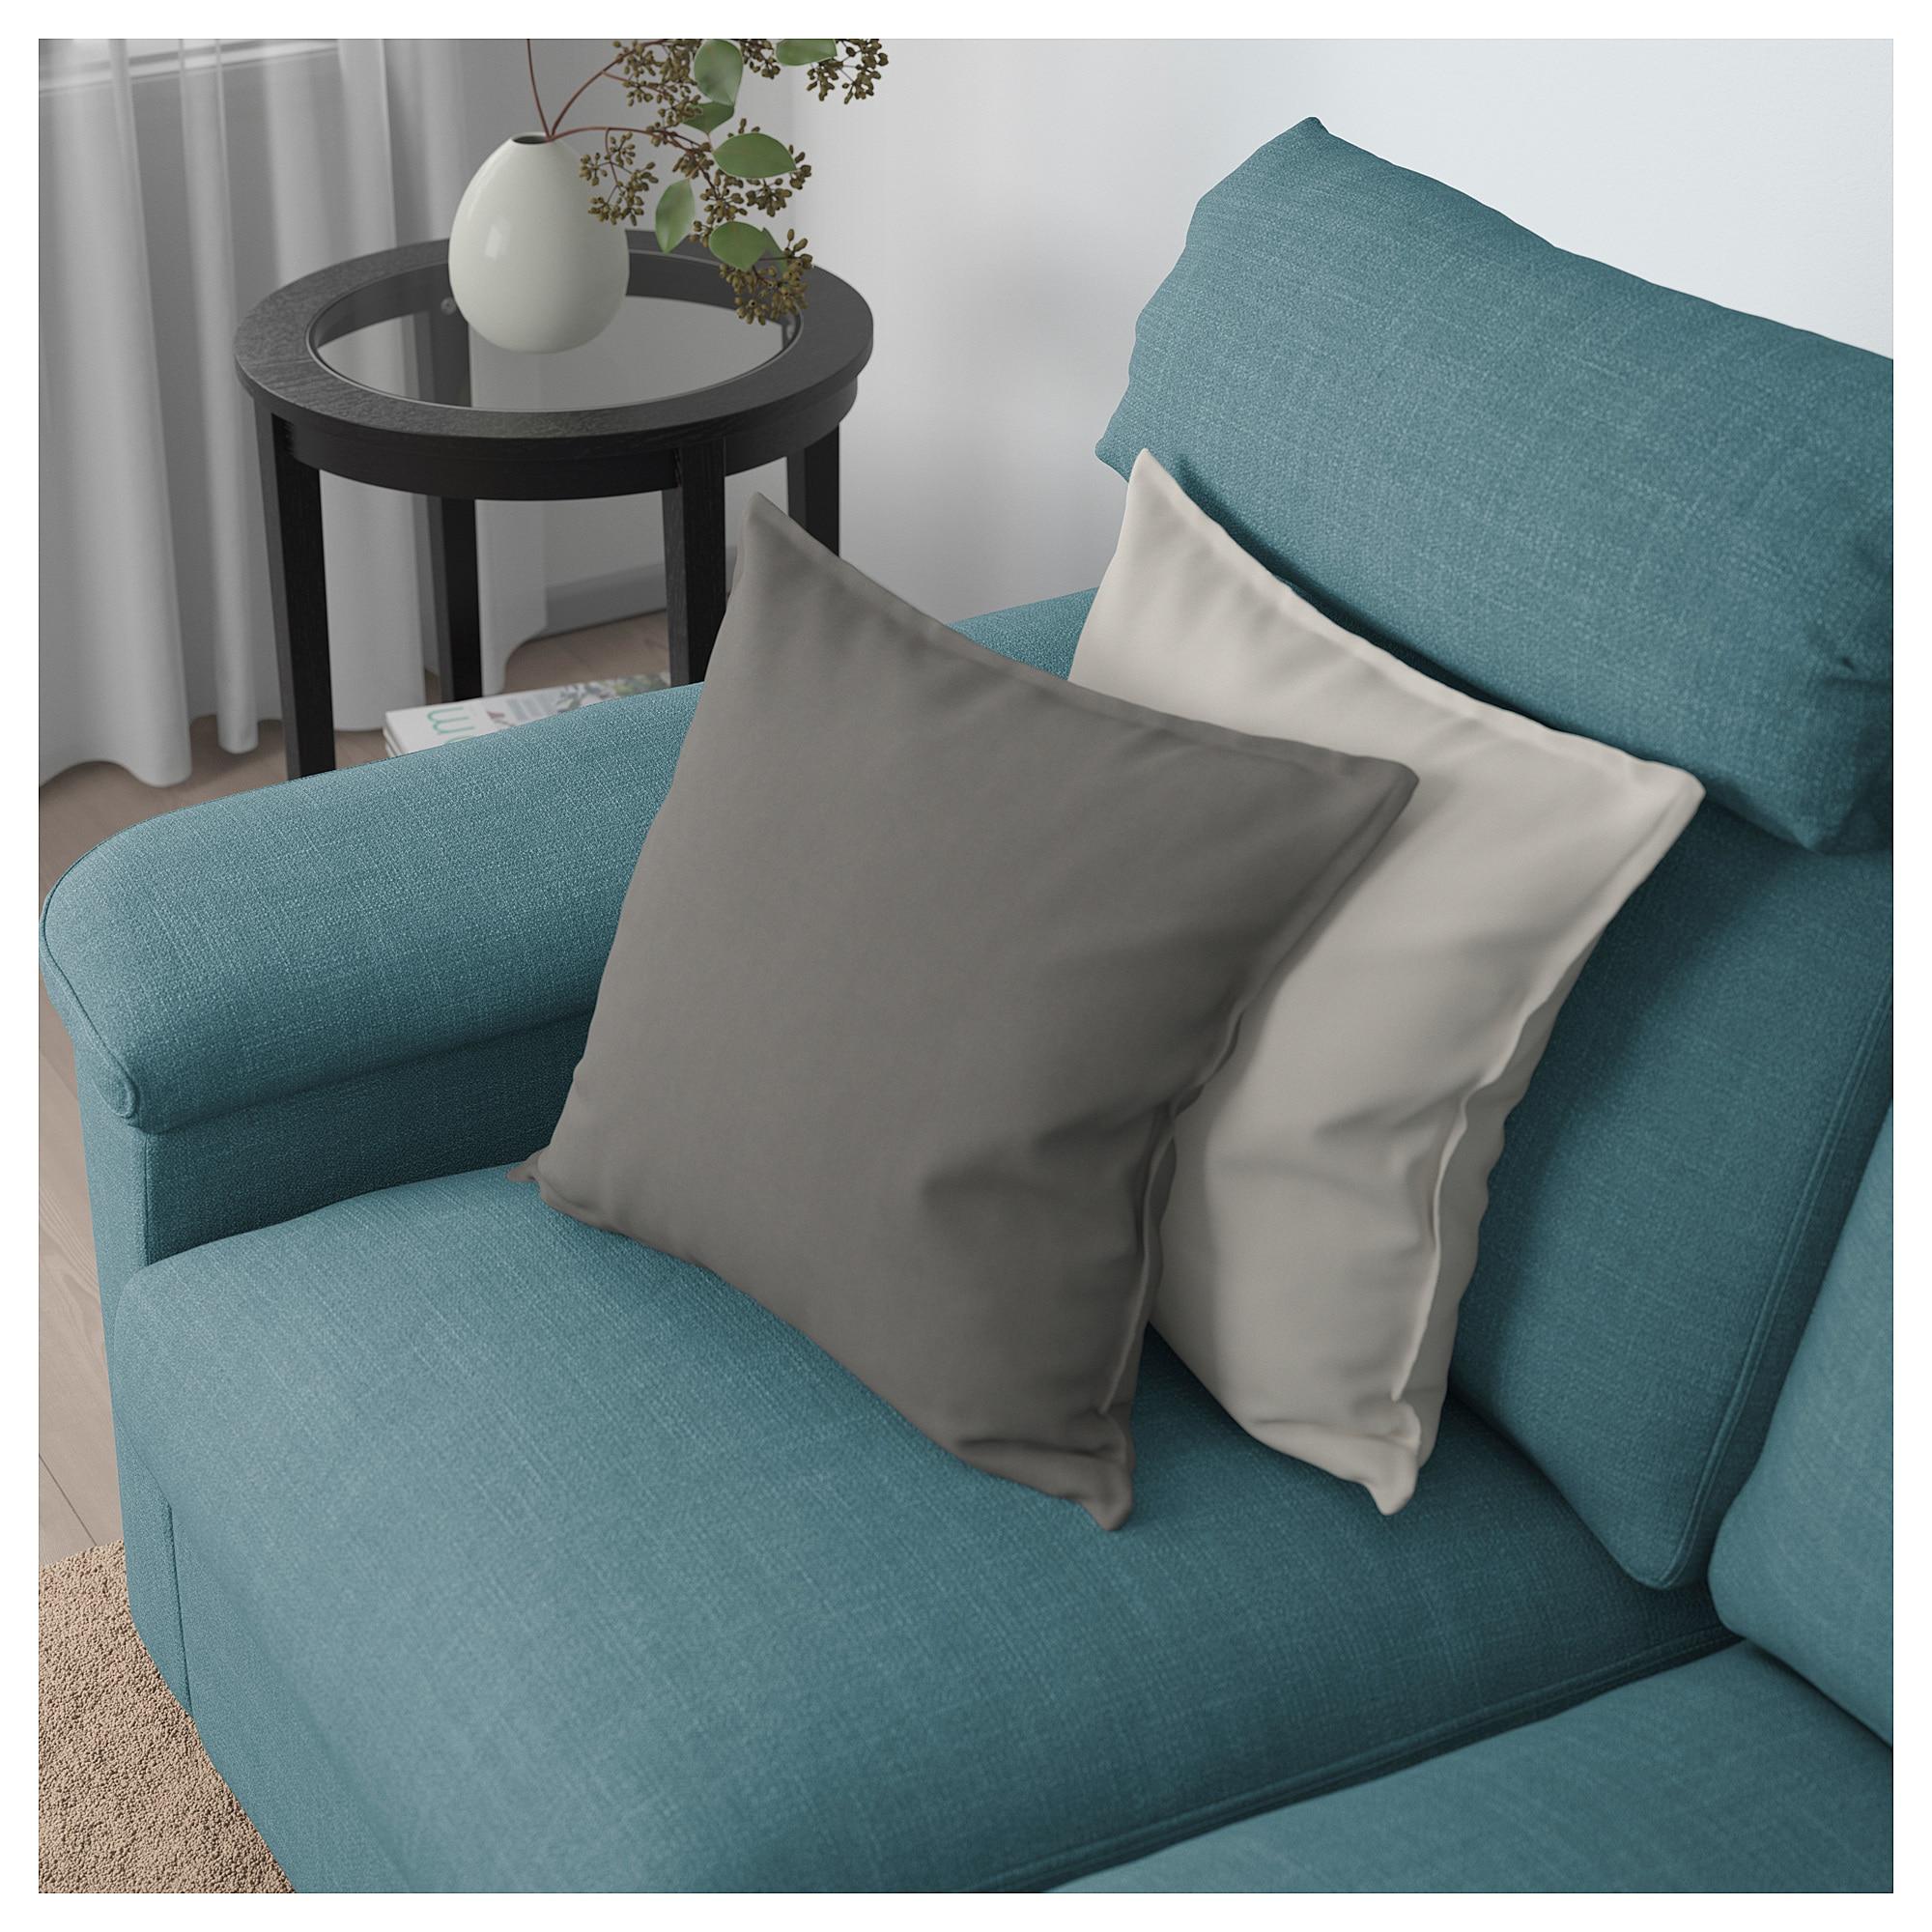 Ikea Lidhult Loveseat Gassebol Blue Gray Sofa Back Cushions Sofa Frame Living Room Sofa